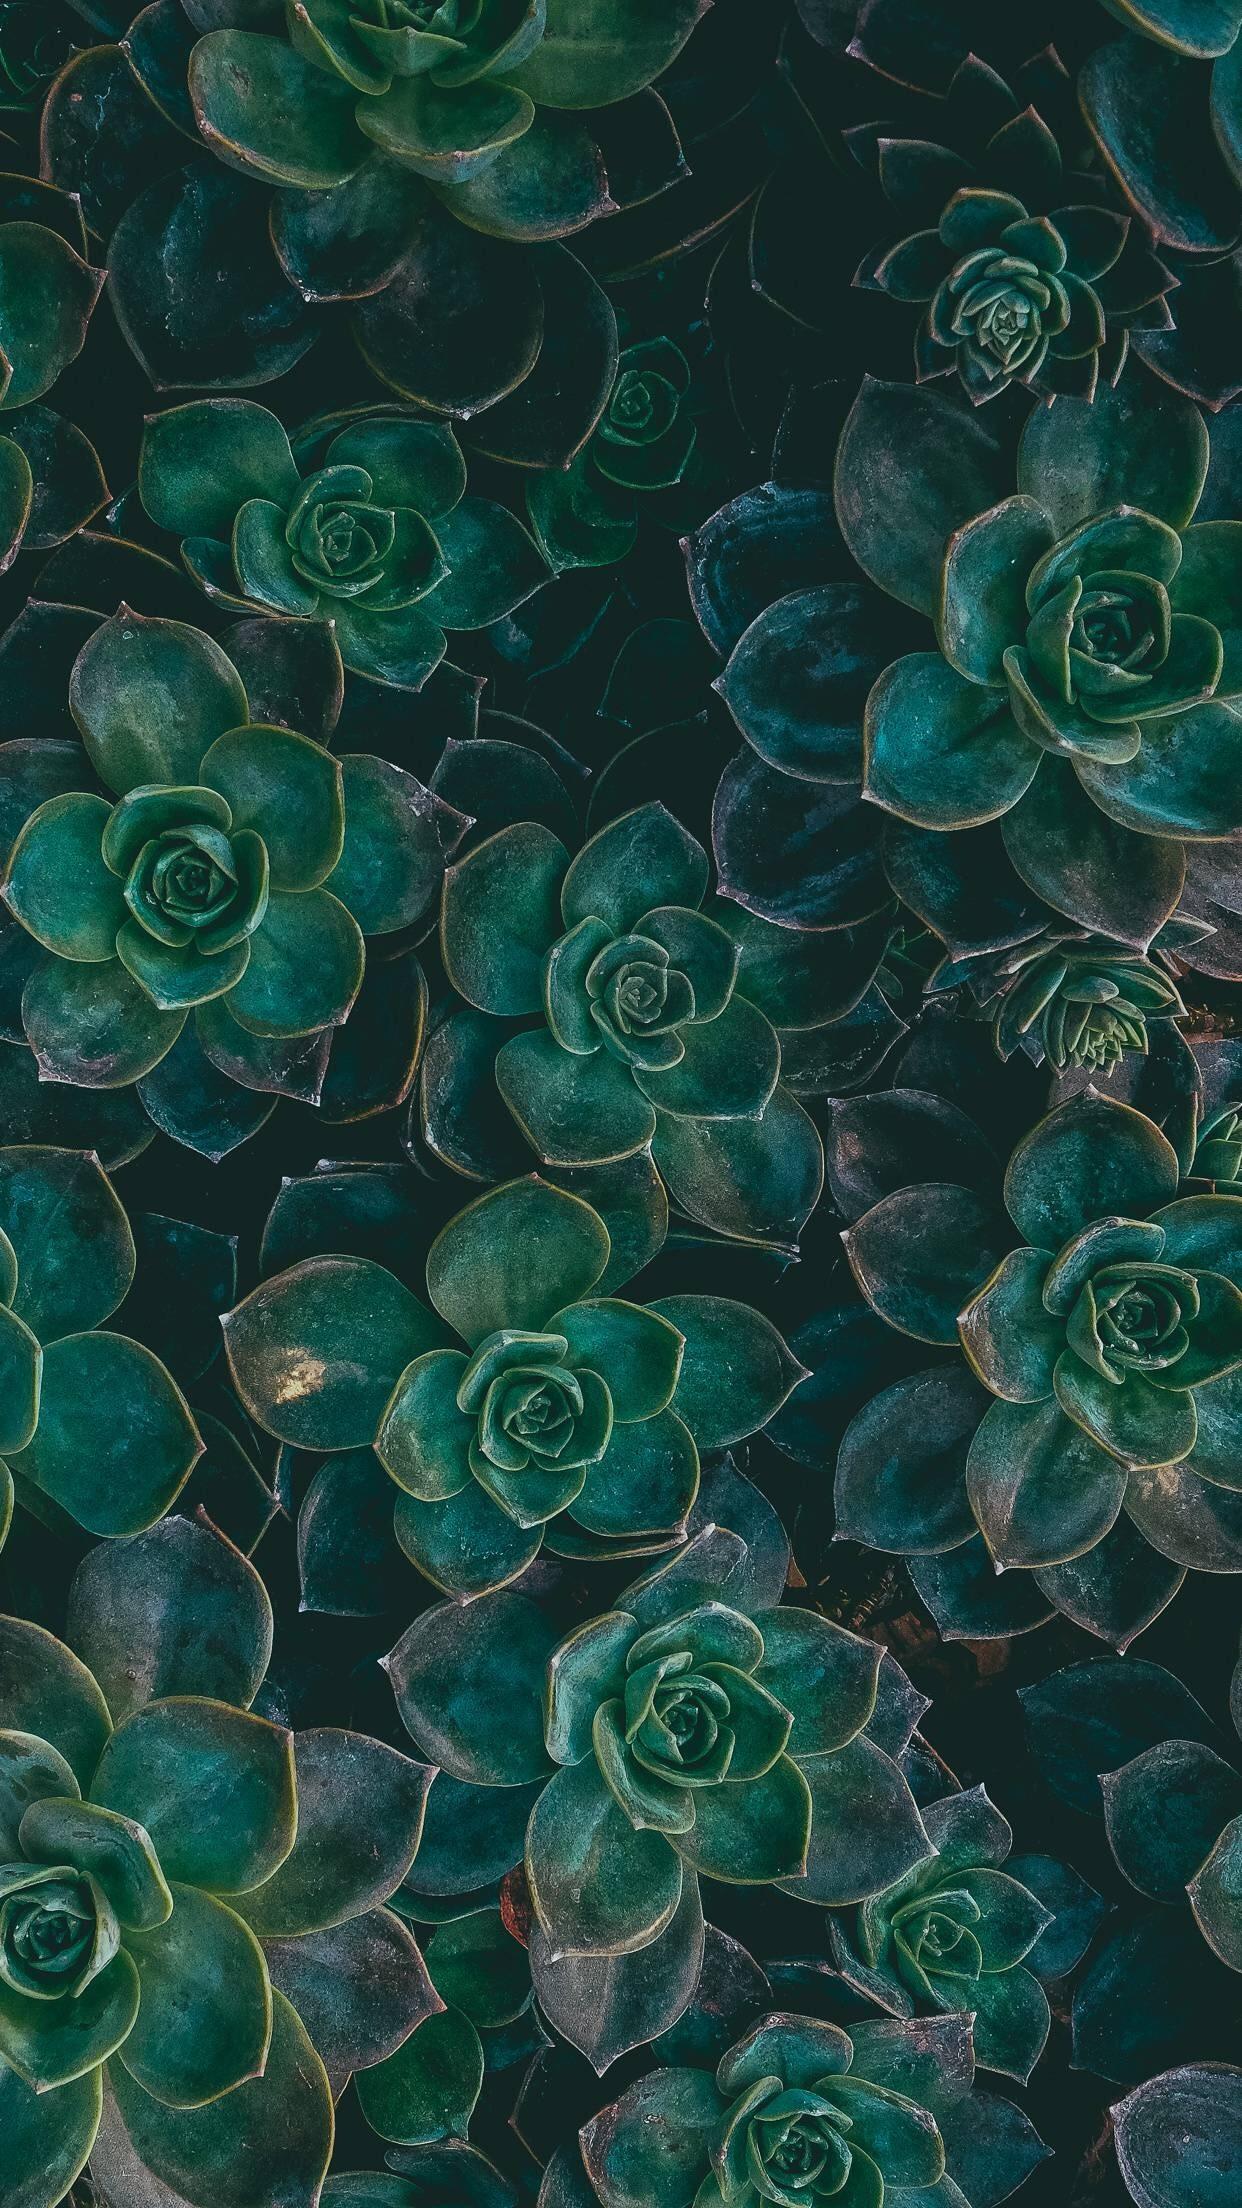 Green Succulents ||. Phone BackgroundsWallpaper BackgroundsIphone WallpapersDark  Wallpaper IphoneMobile WallpaperNature WallpaperIphone …